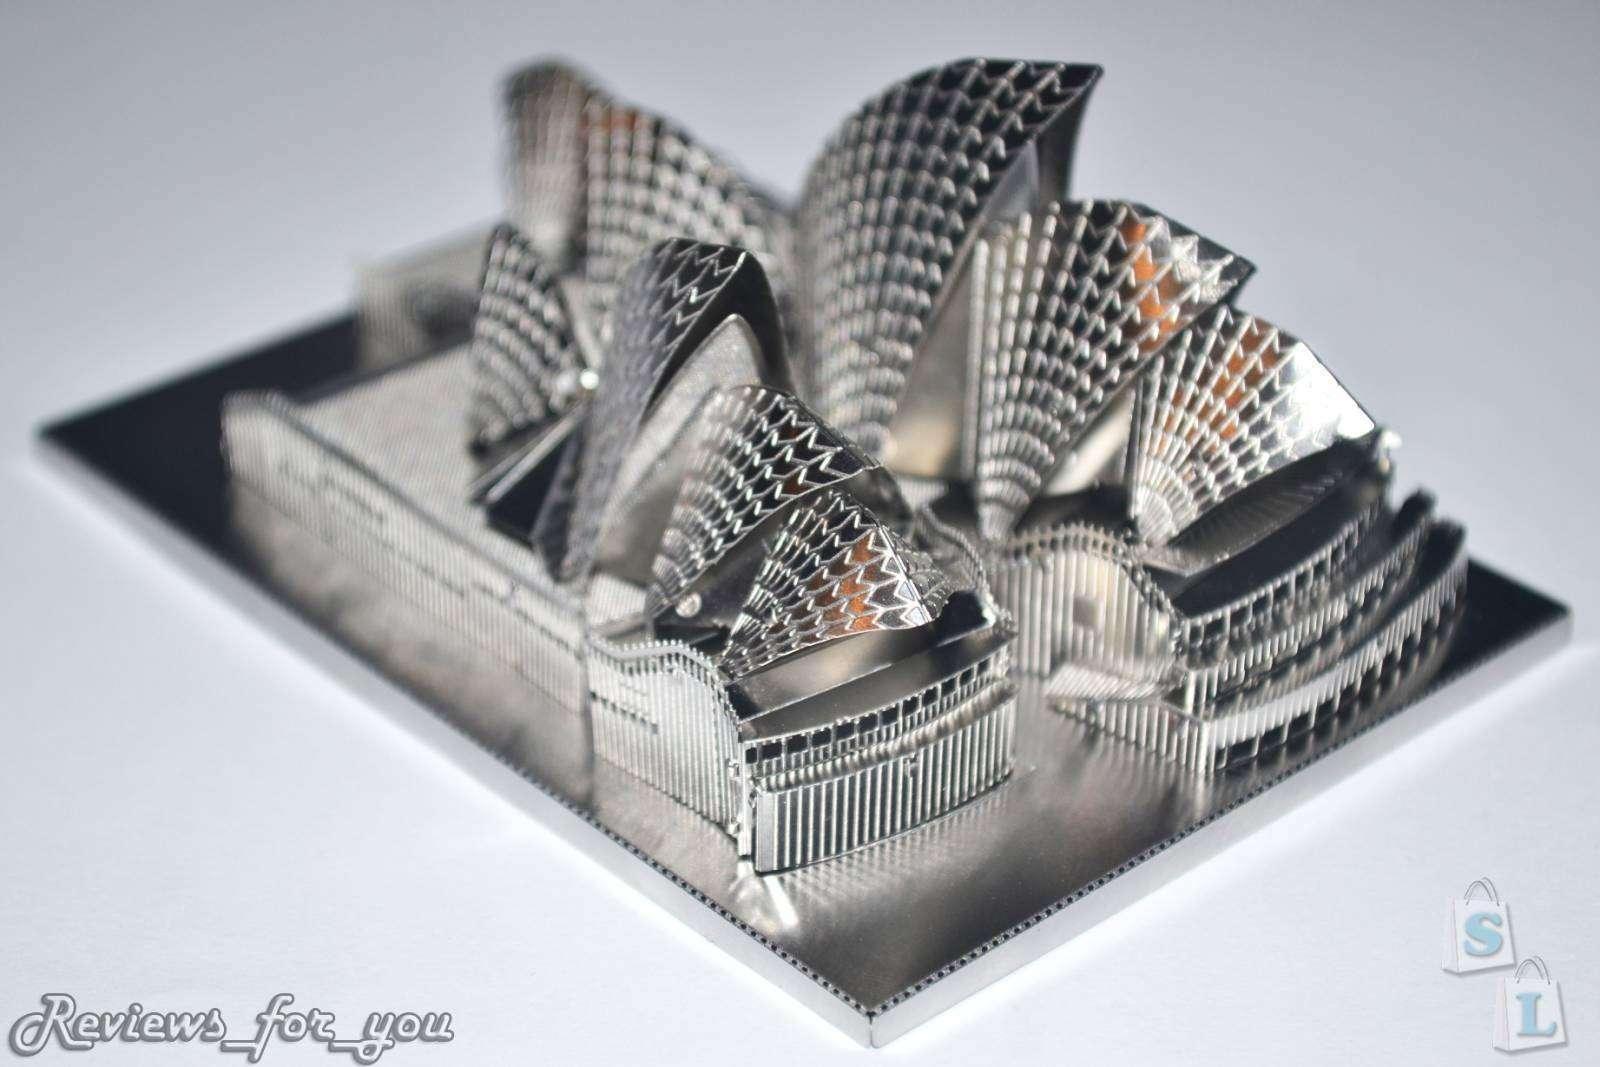 ChinaBuye: Металлический 3D пазл - 'Сиднейский оперный театр', Sydney Opera House Model 3D DIY